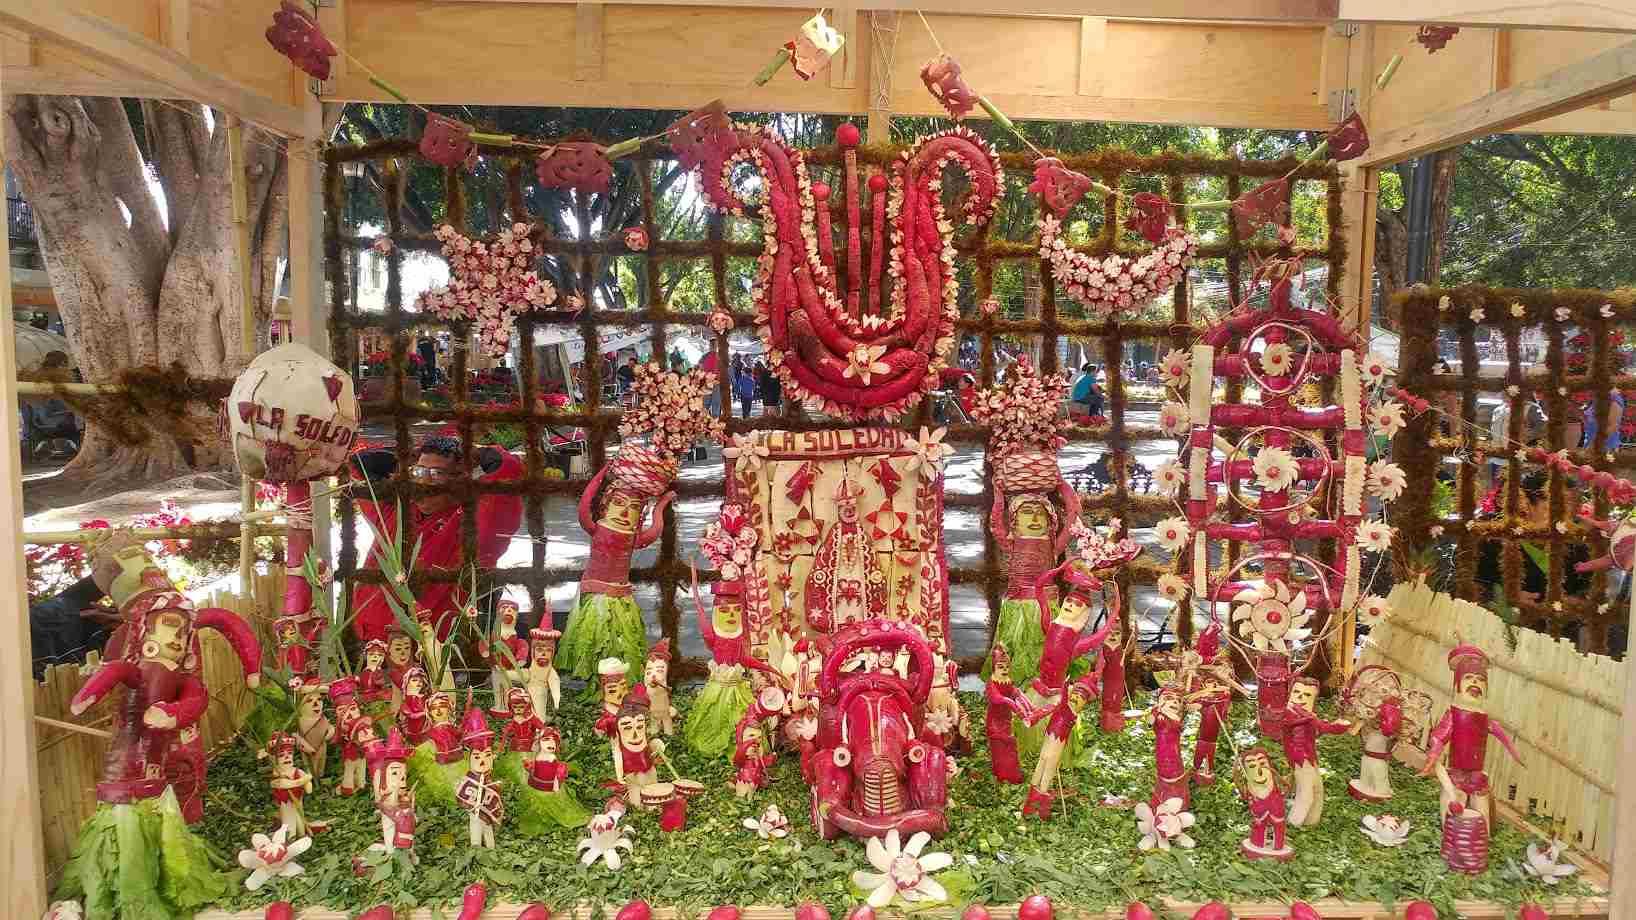 Display for Oaxaca's radish festival